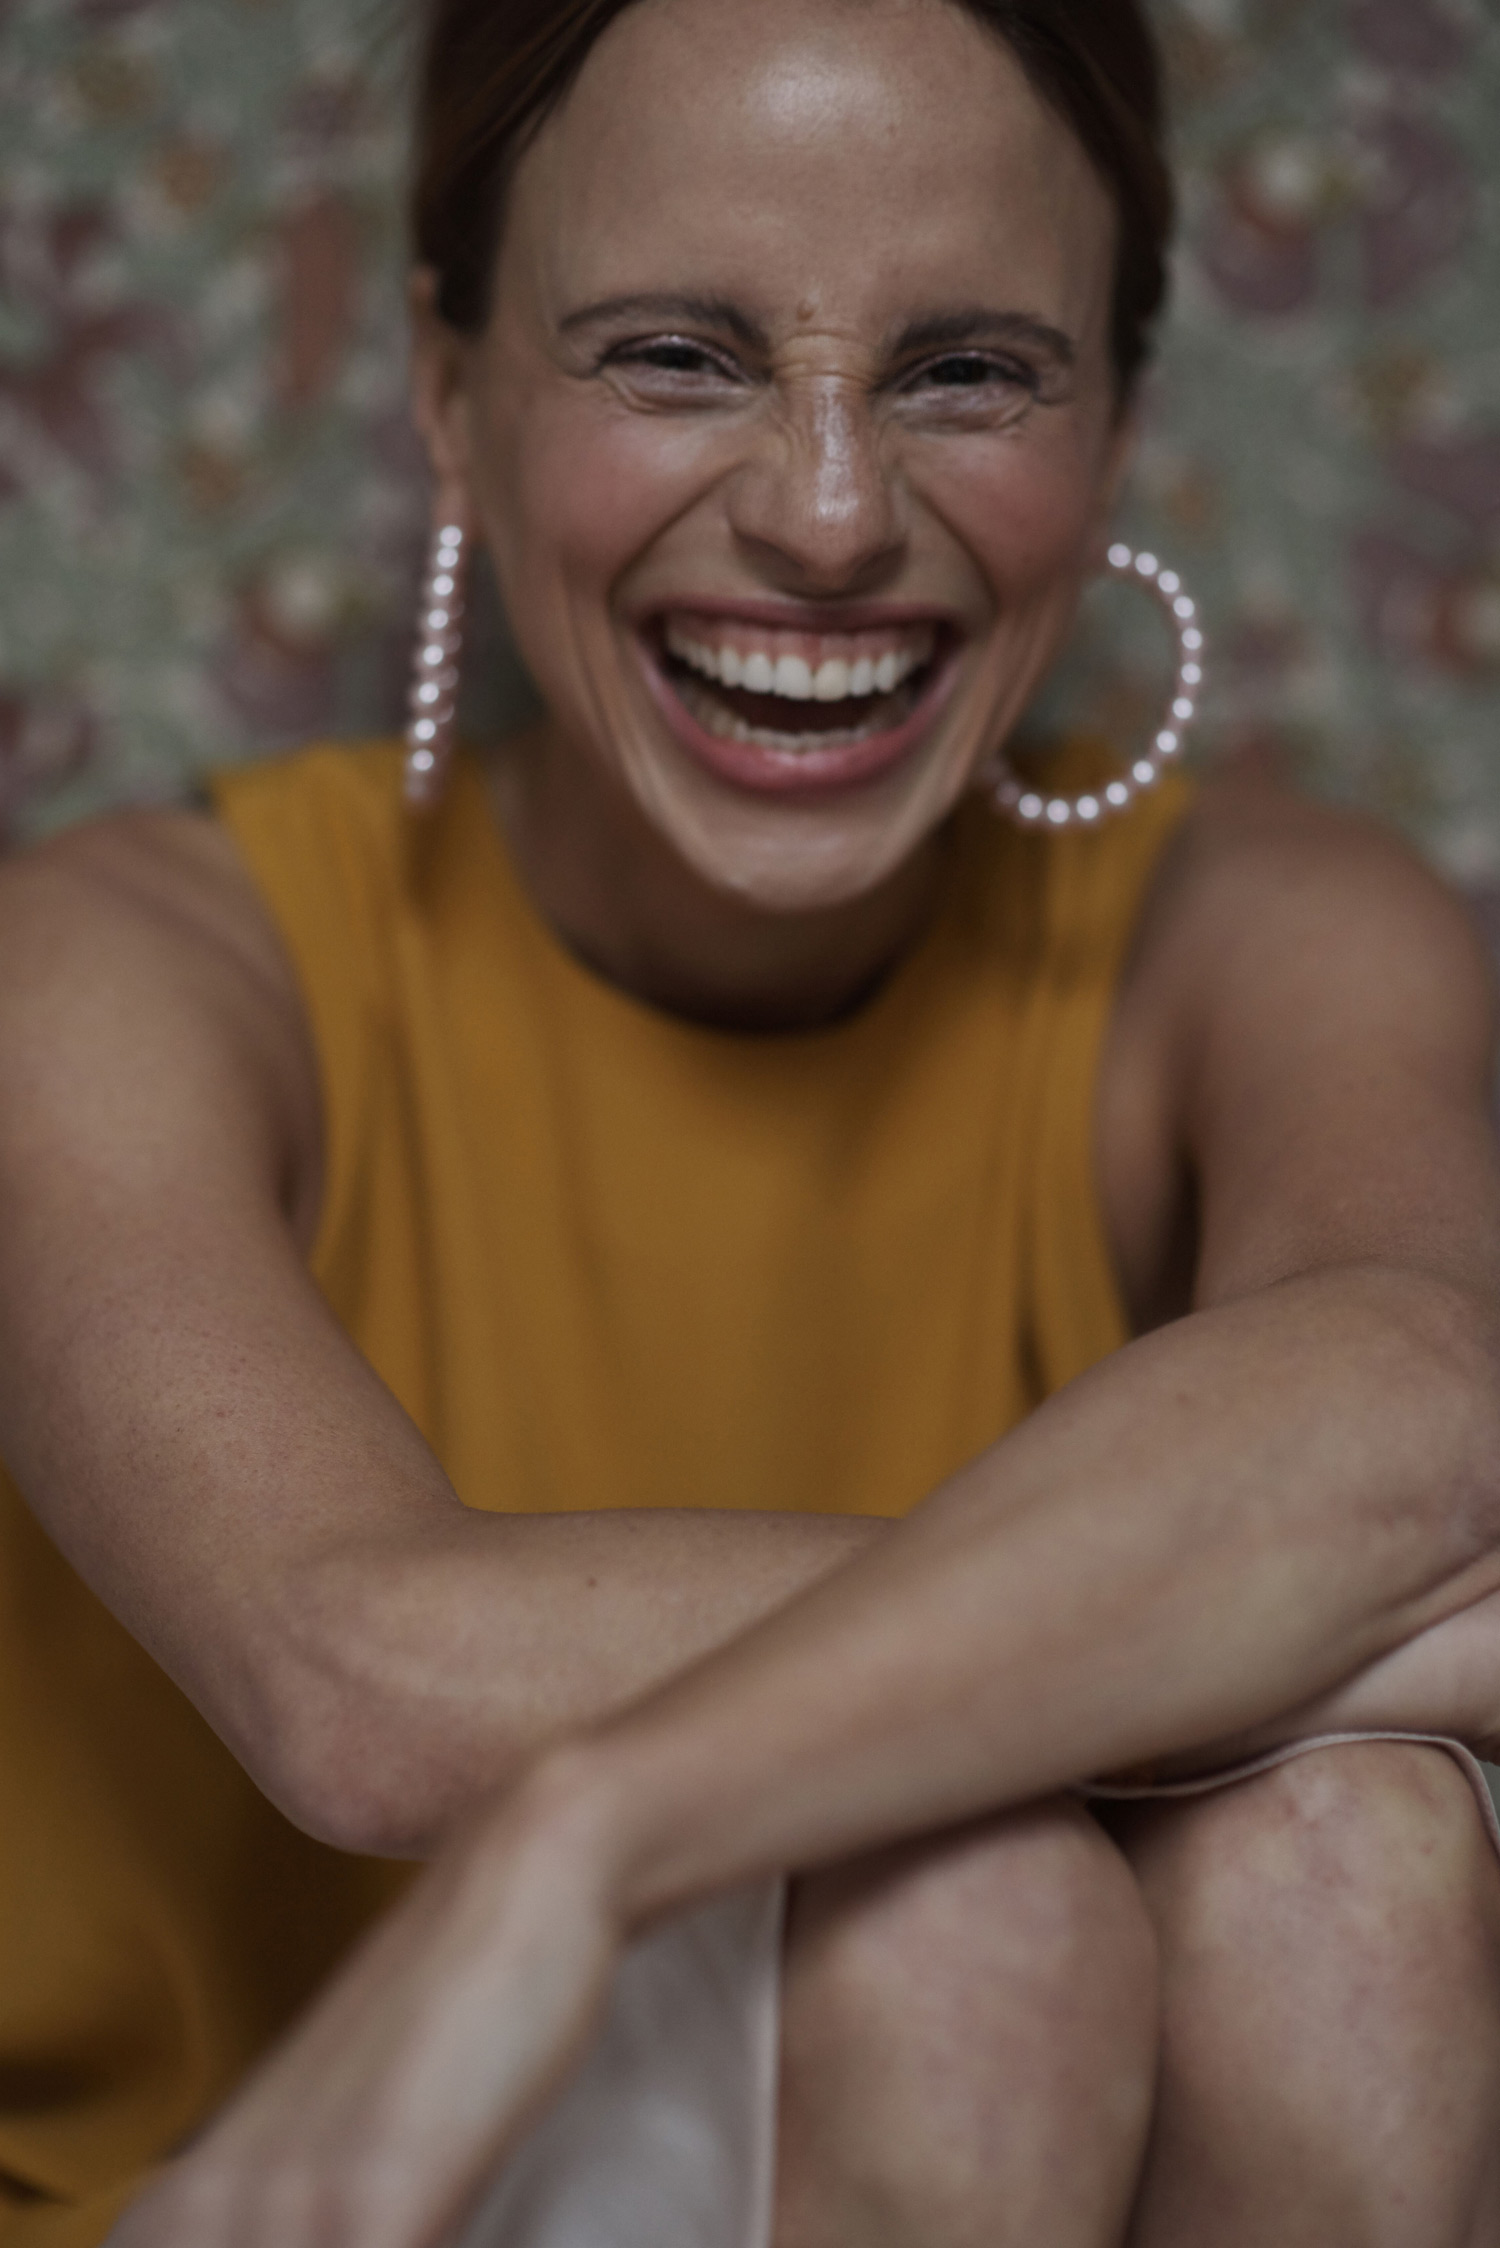 Rosa Macher Sleeveless Top 001 in Mustard and Slip Skirt 001 in Pearl